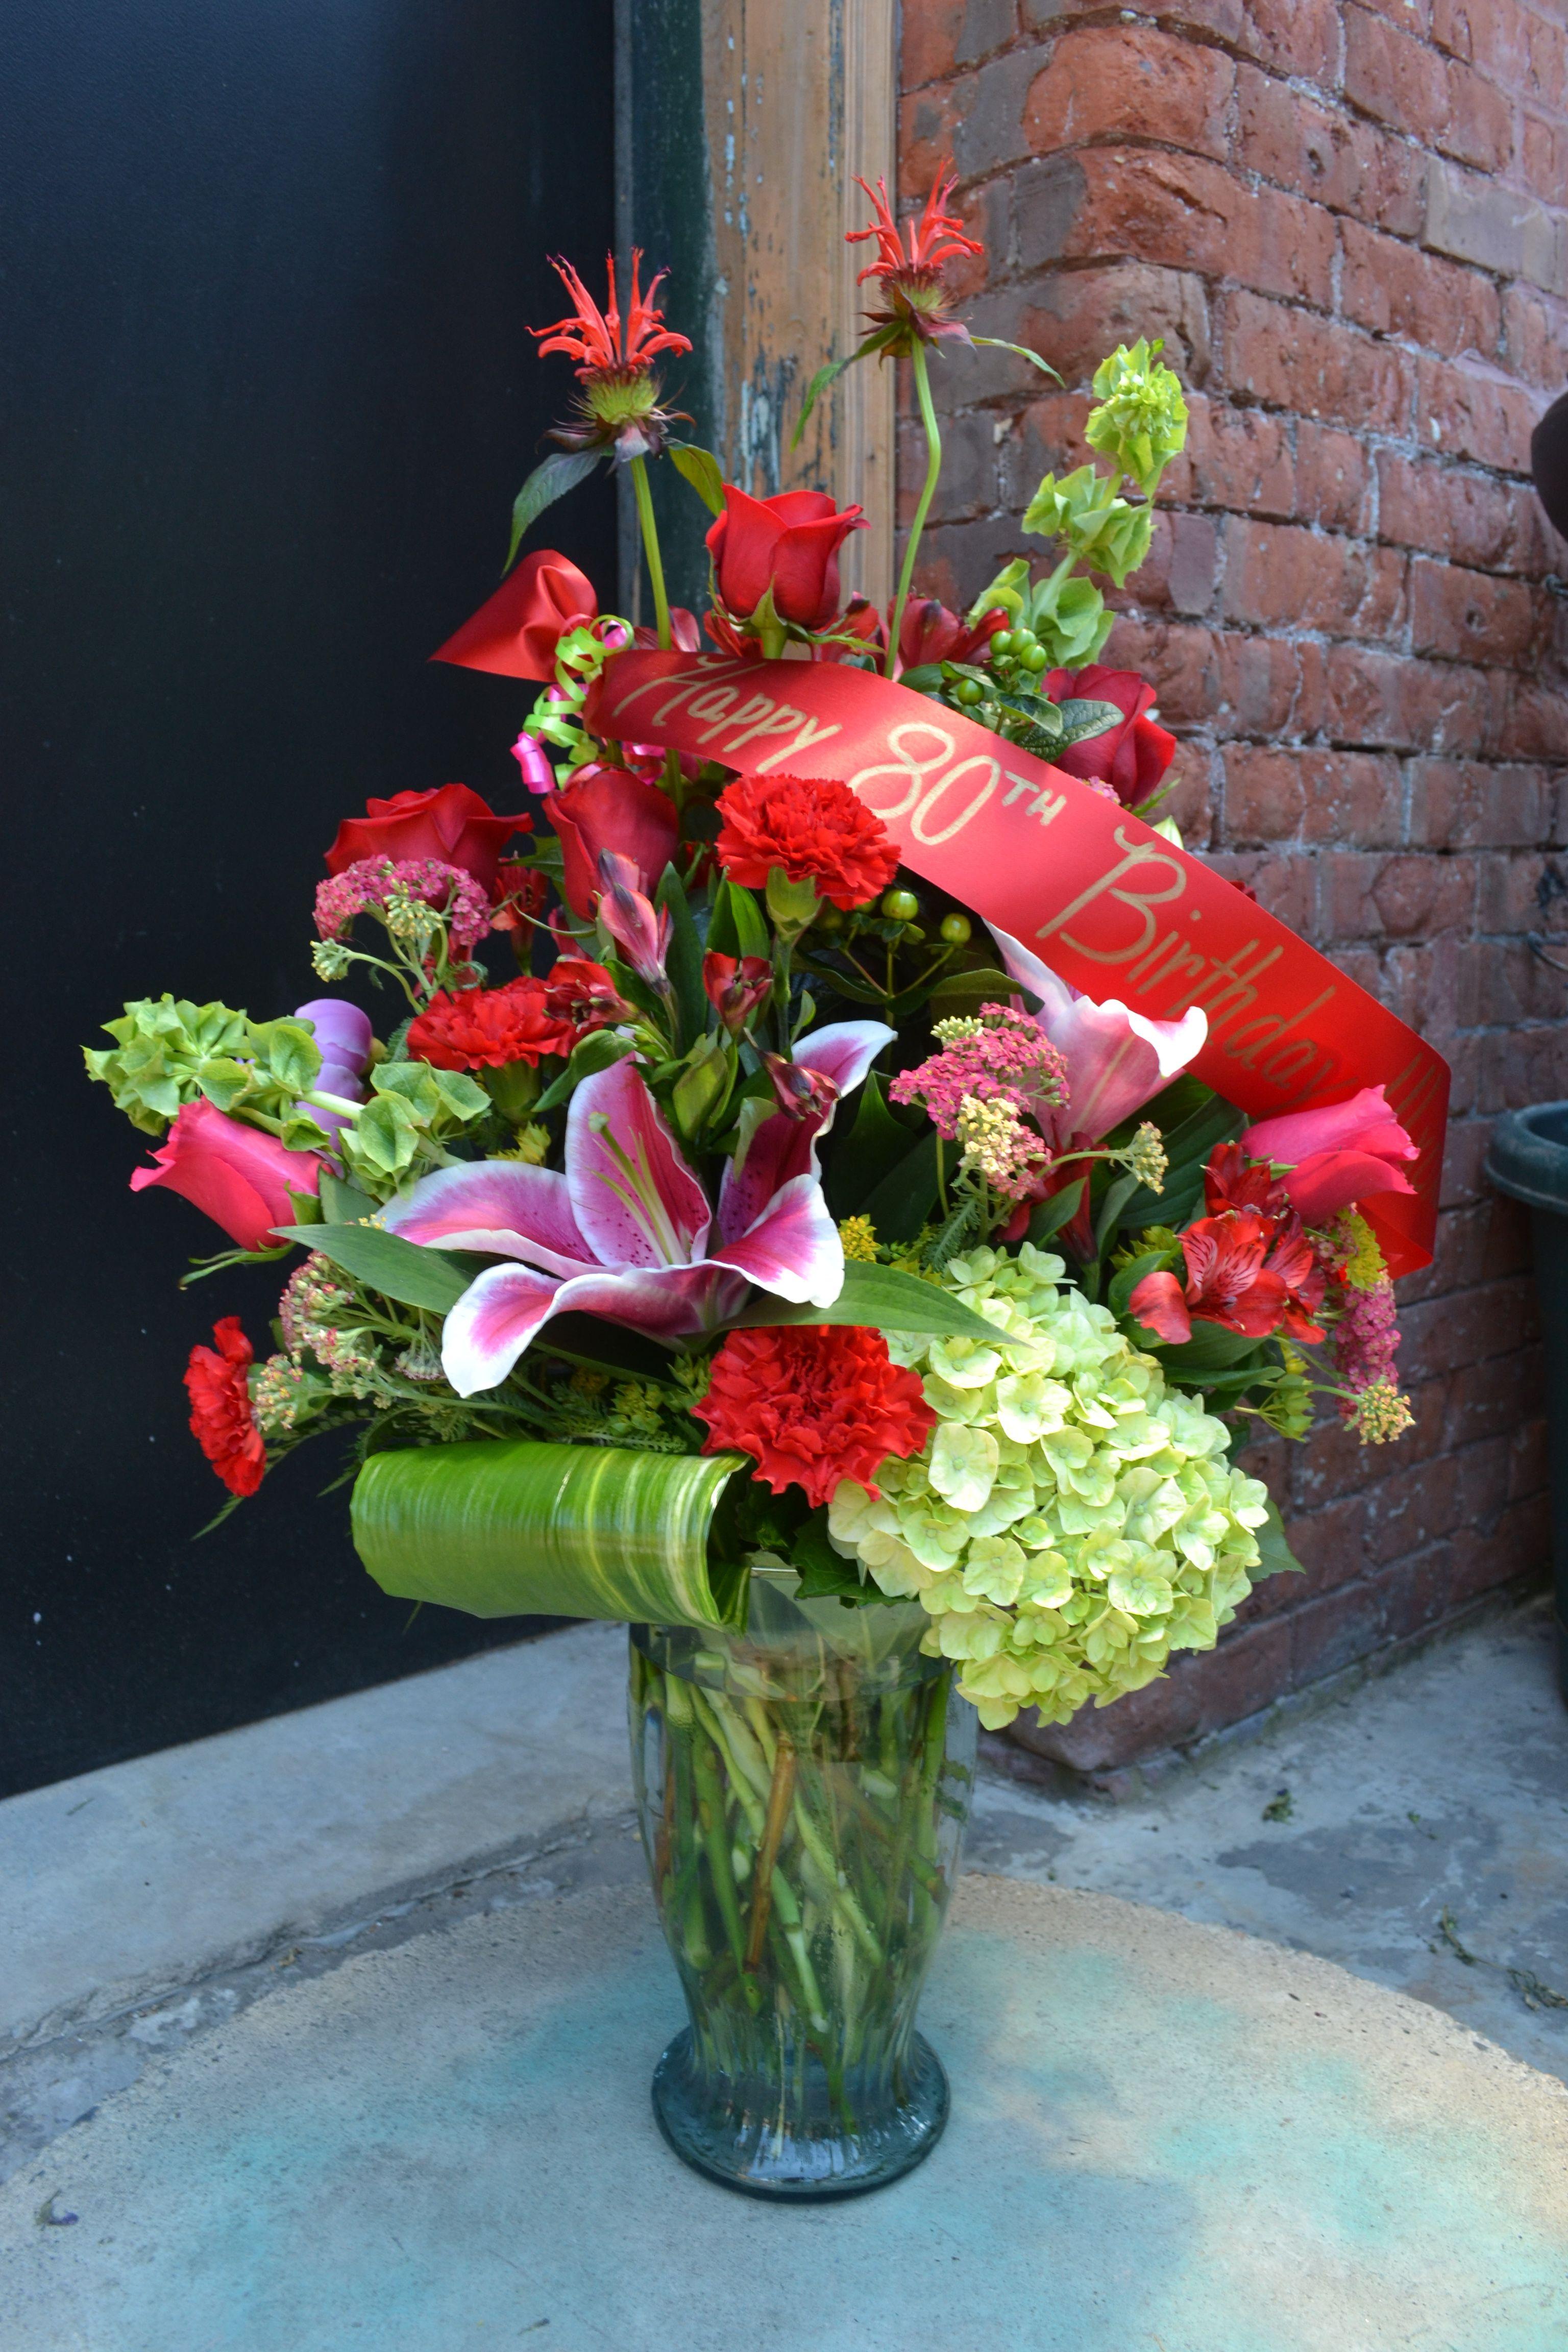 Birthday flowers for 80th birthday by terris flower shop in birthday flowers for 80th birthday by terris flower shop in naugatuck izmirmasajfo